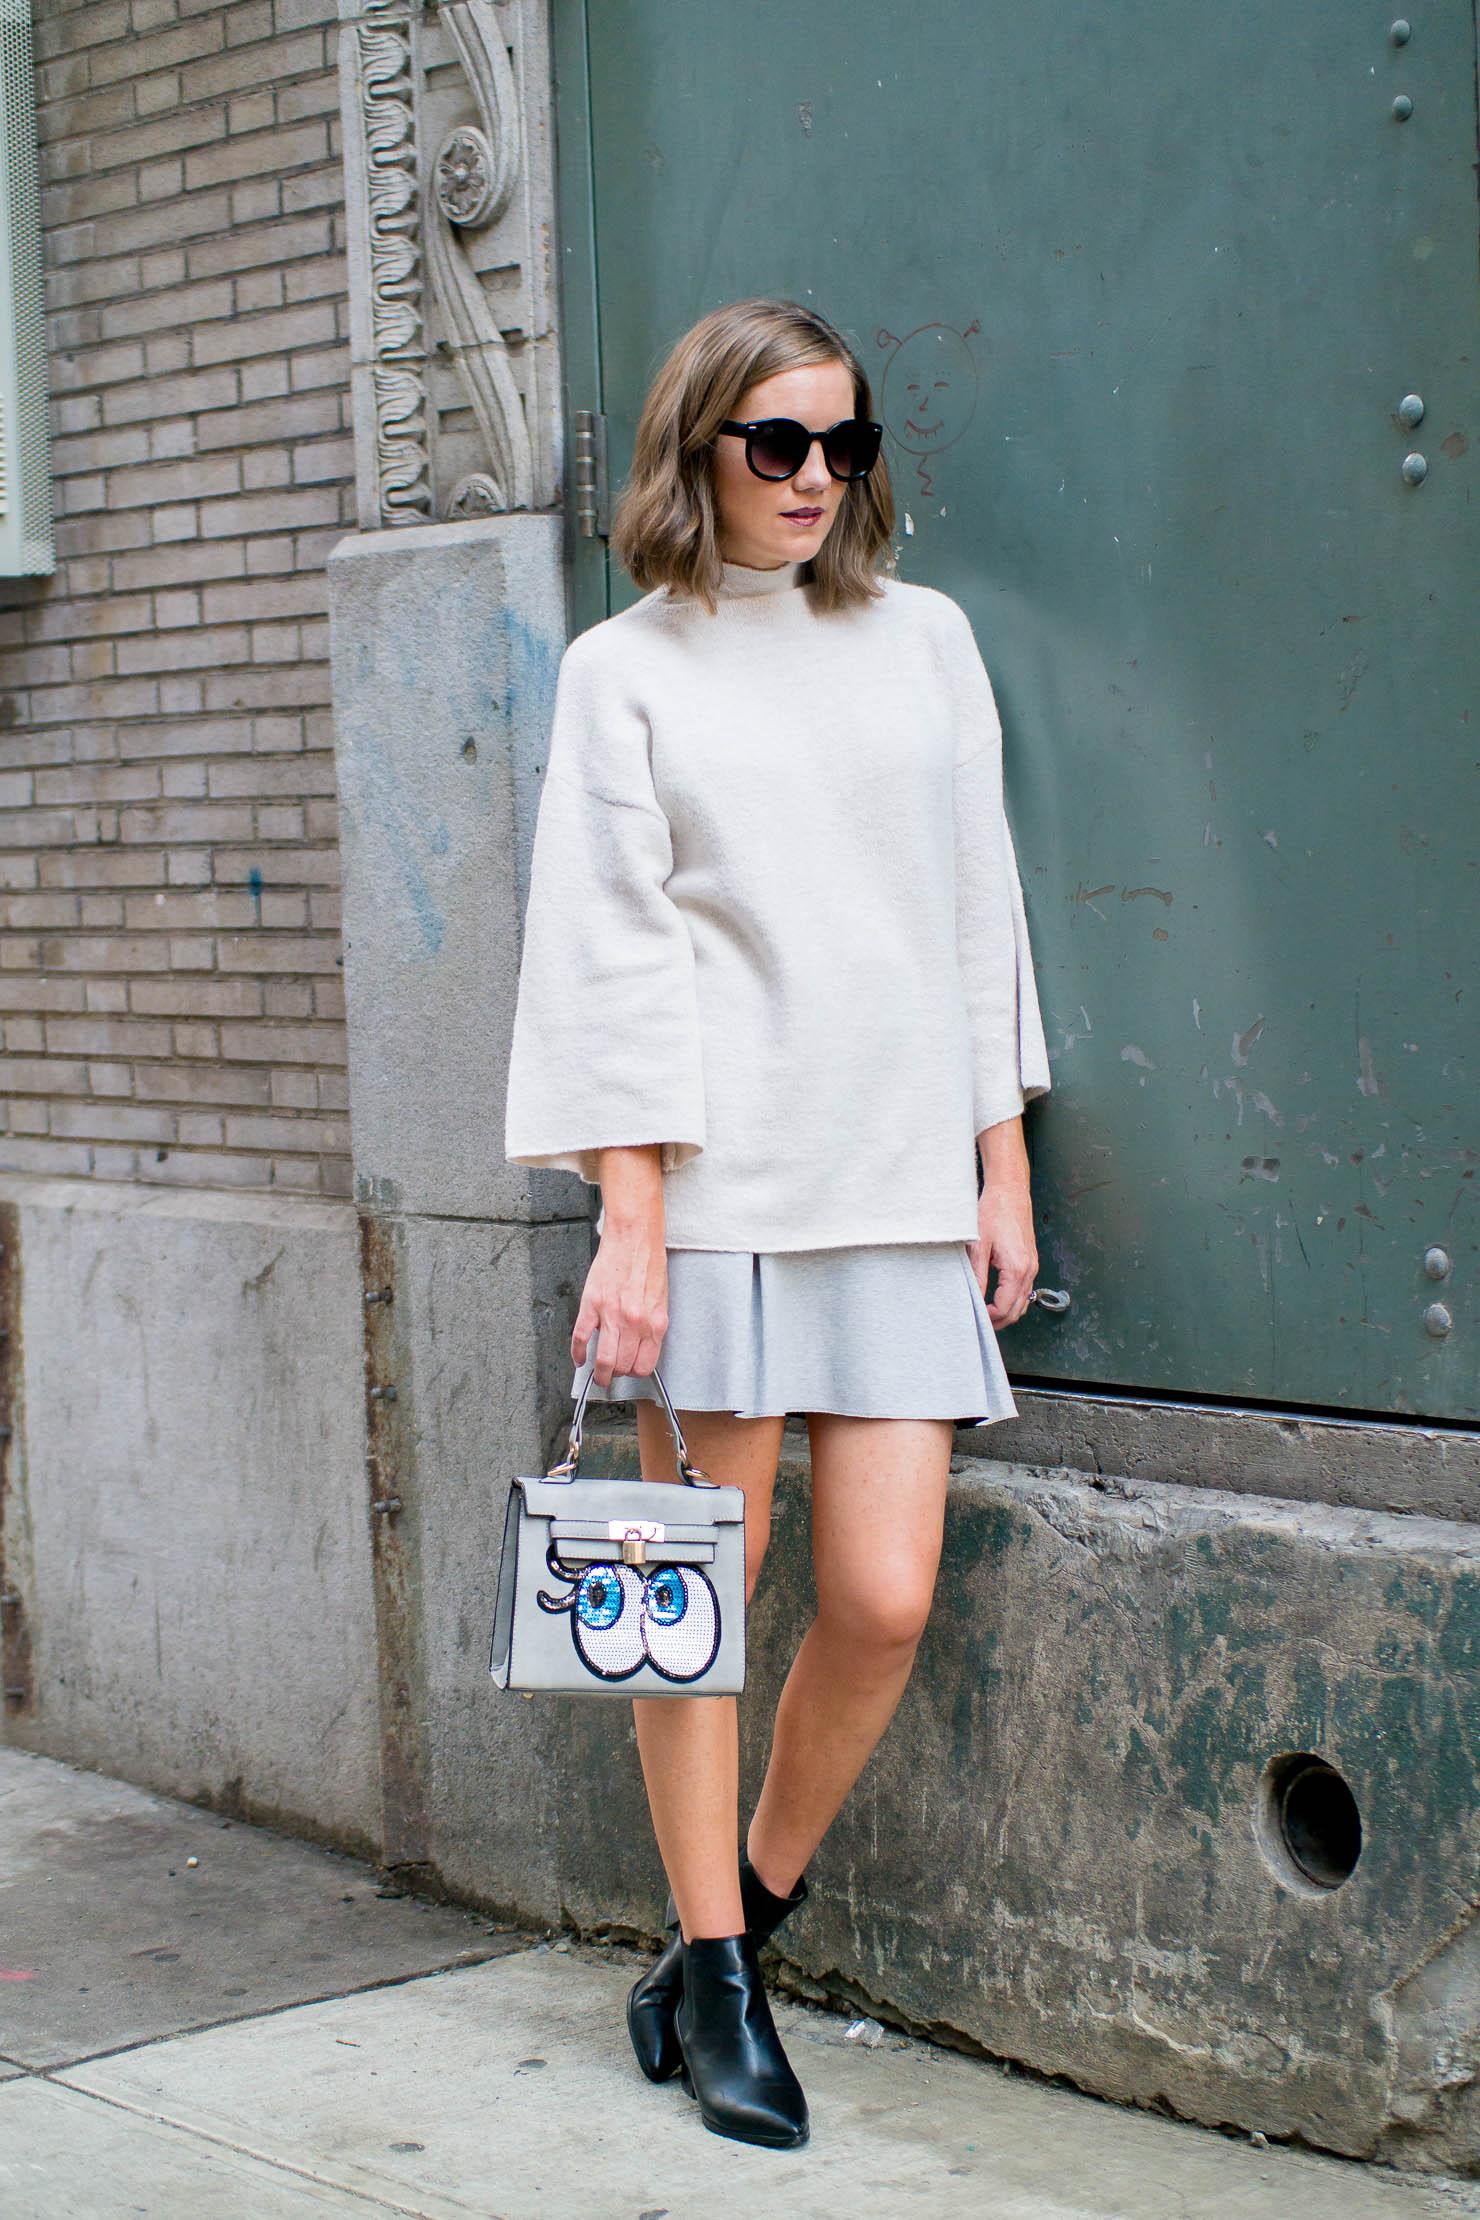 nyfw-sequin-eye-satchel-street-style-new-york-fashion-week